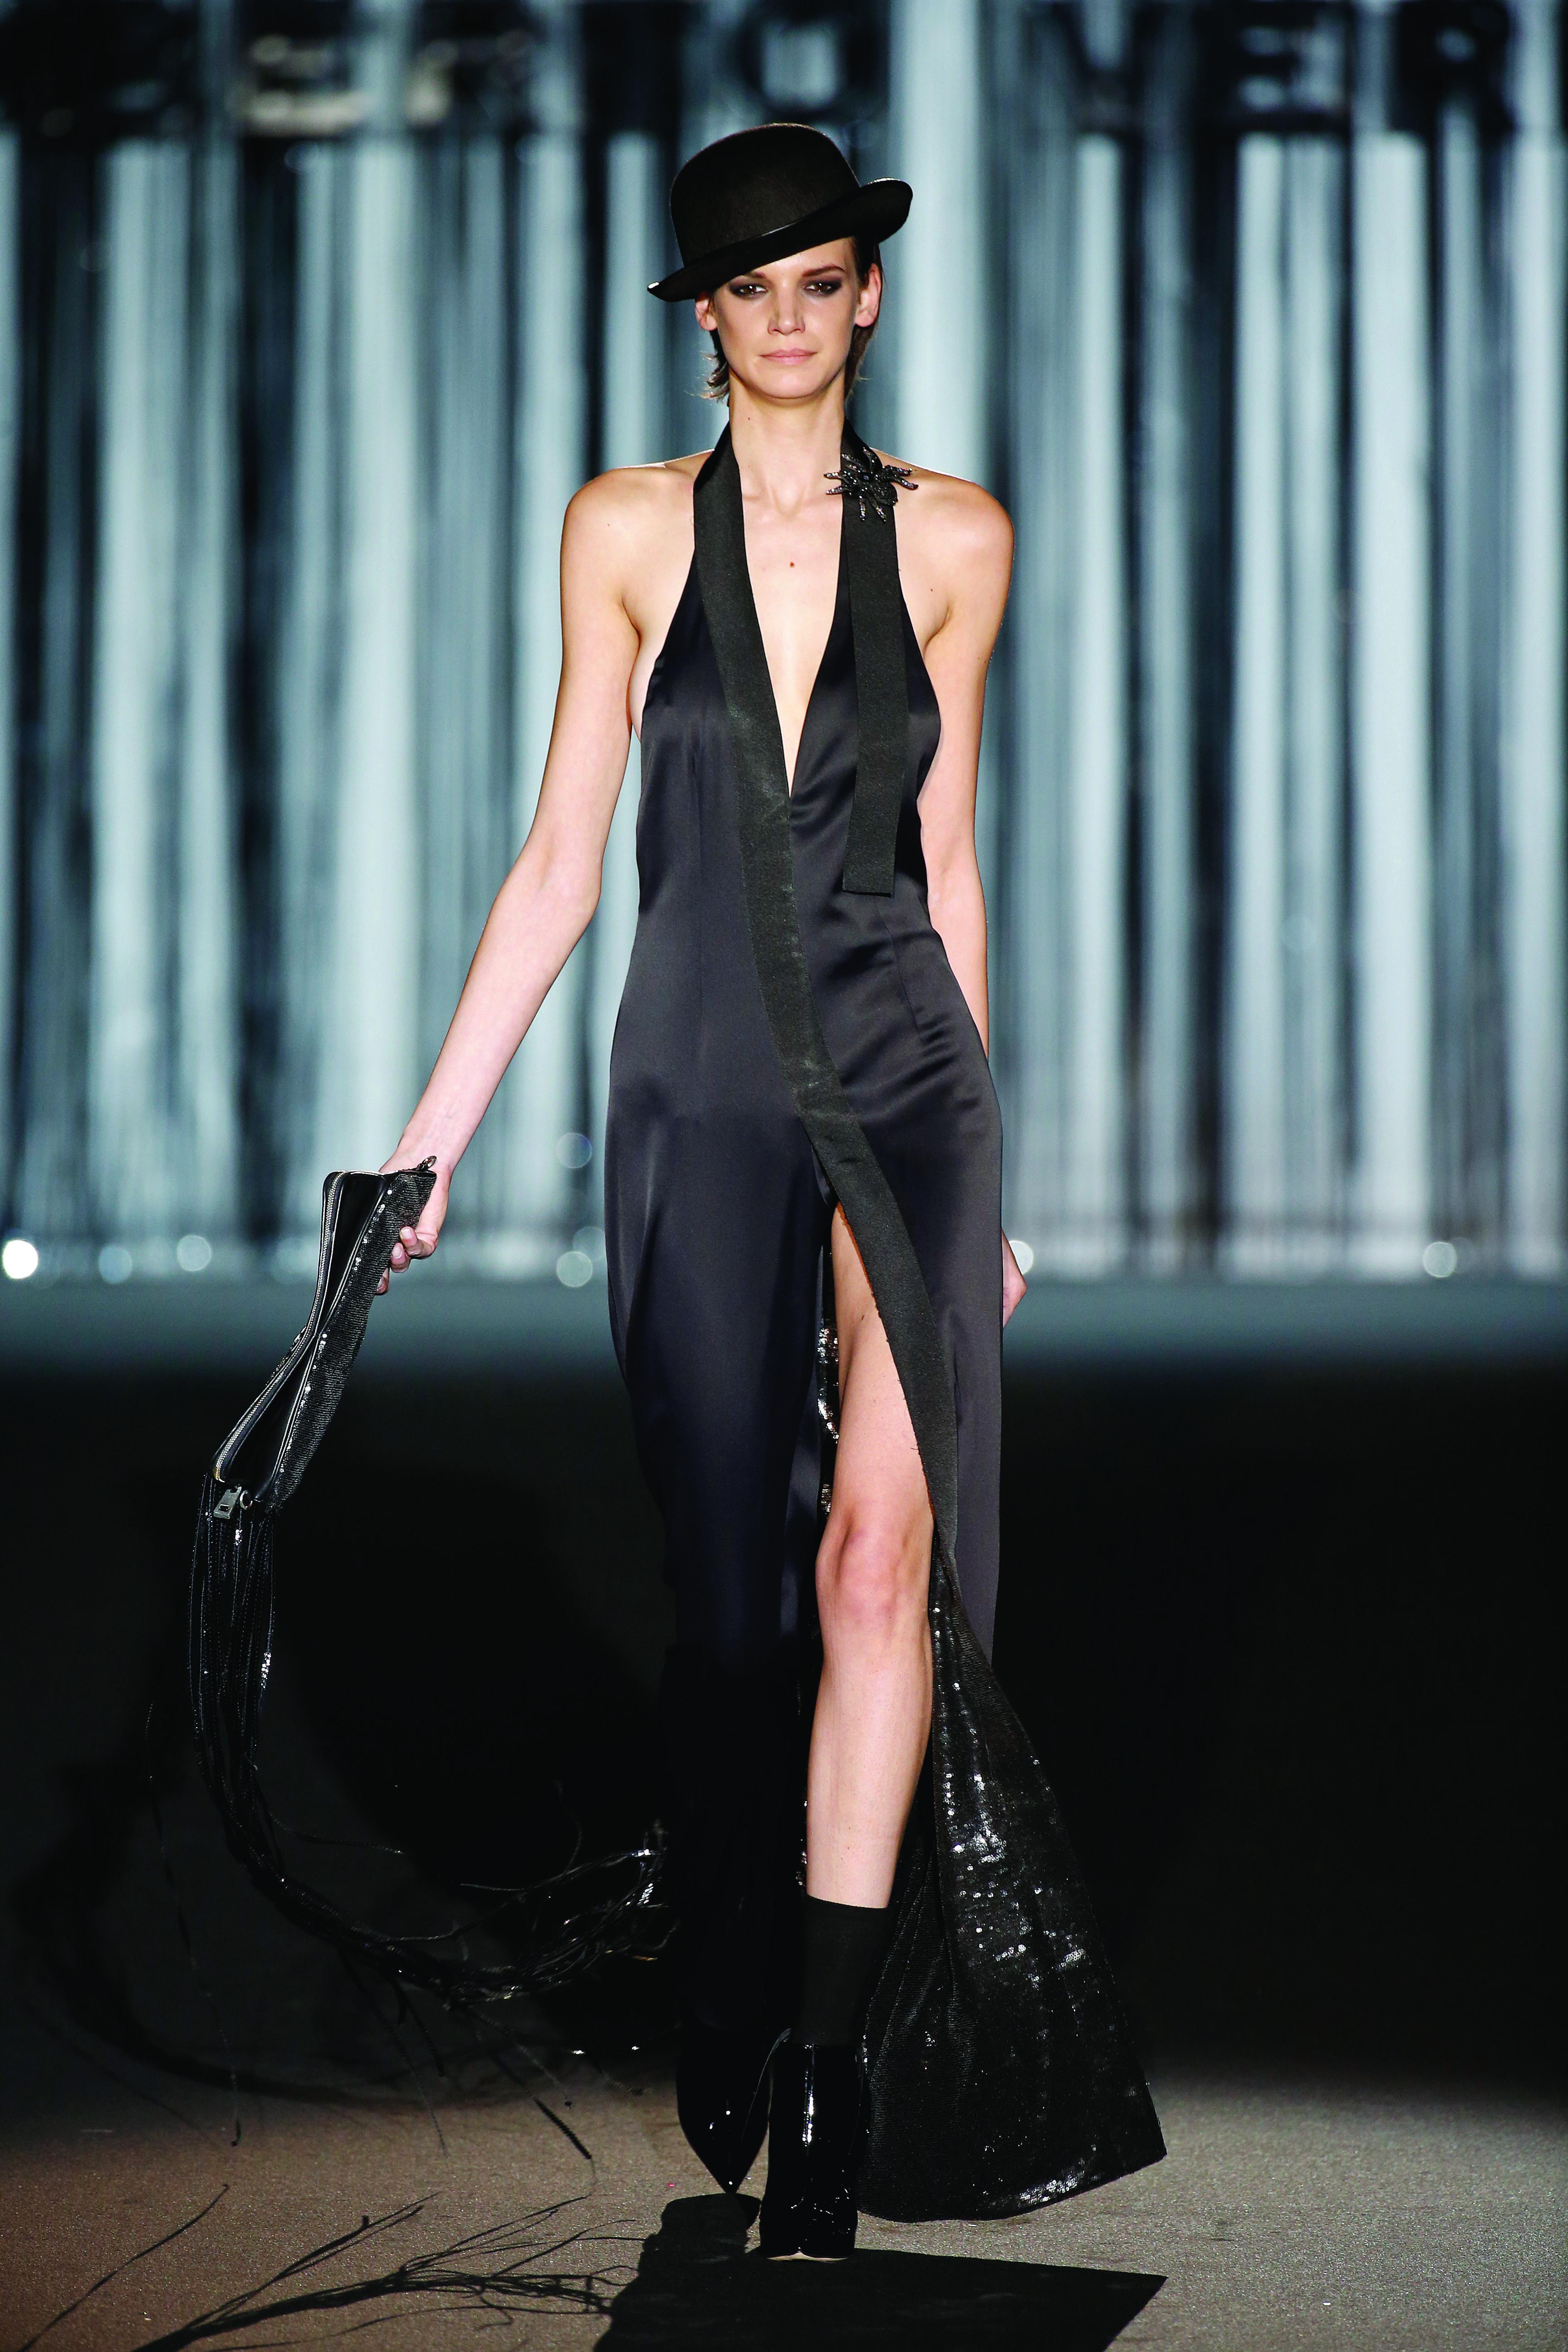 Roberto Verino Madrid Mercedes Benz Fashion Week Automne Hiver 2015 Luxsure